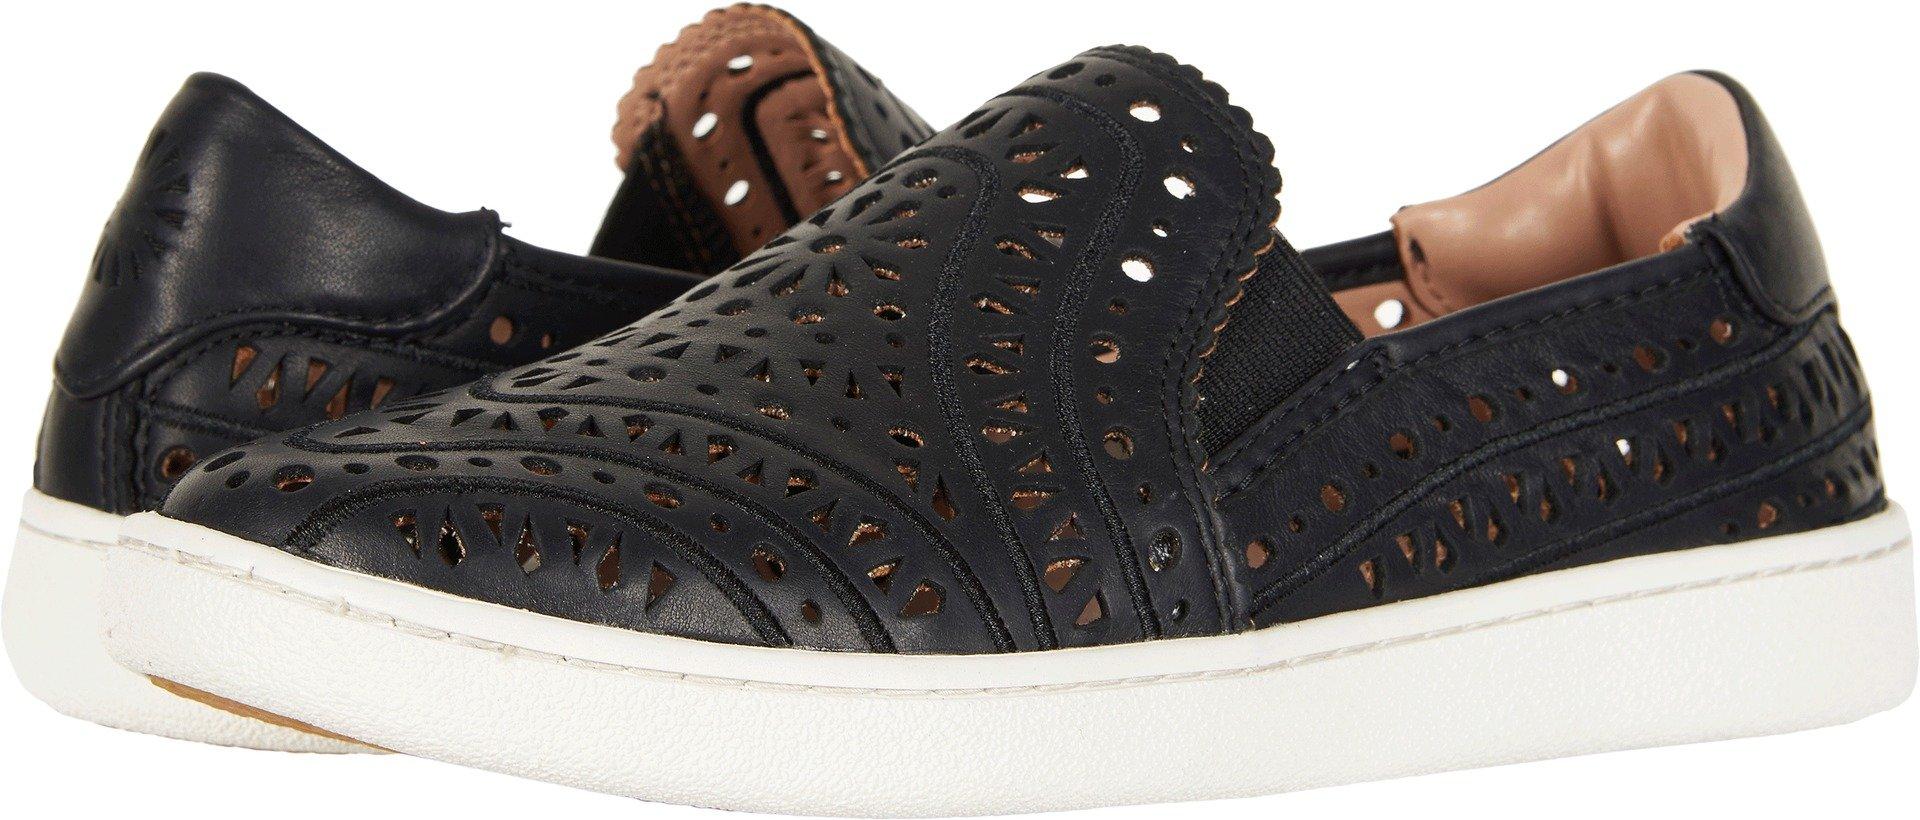 UGG Women's CAS Perf Sneaker, Black, 8.5 M US by UGG